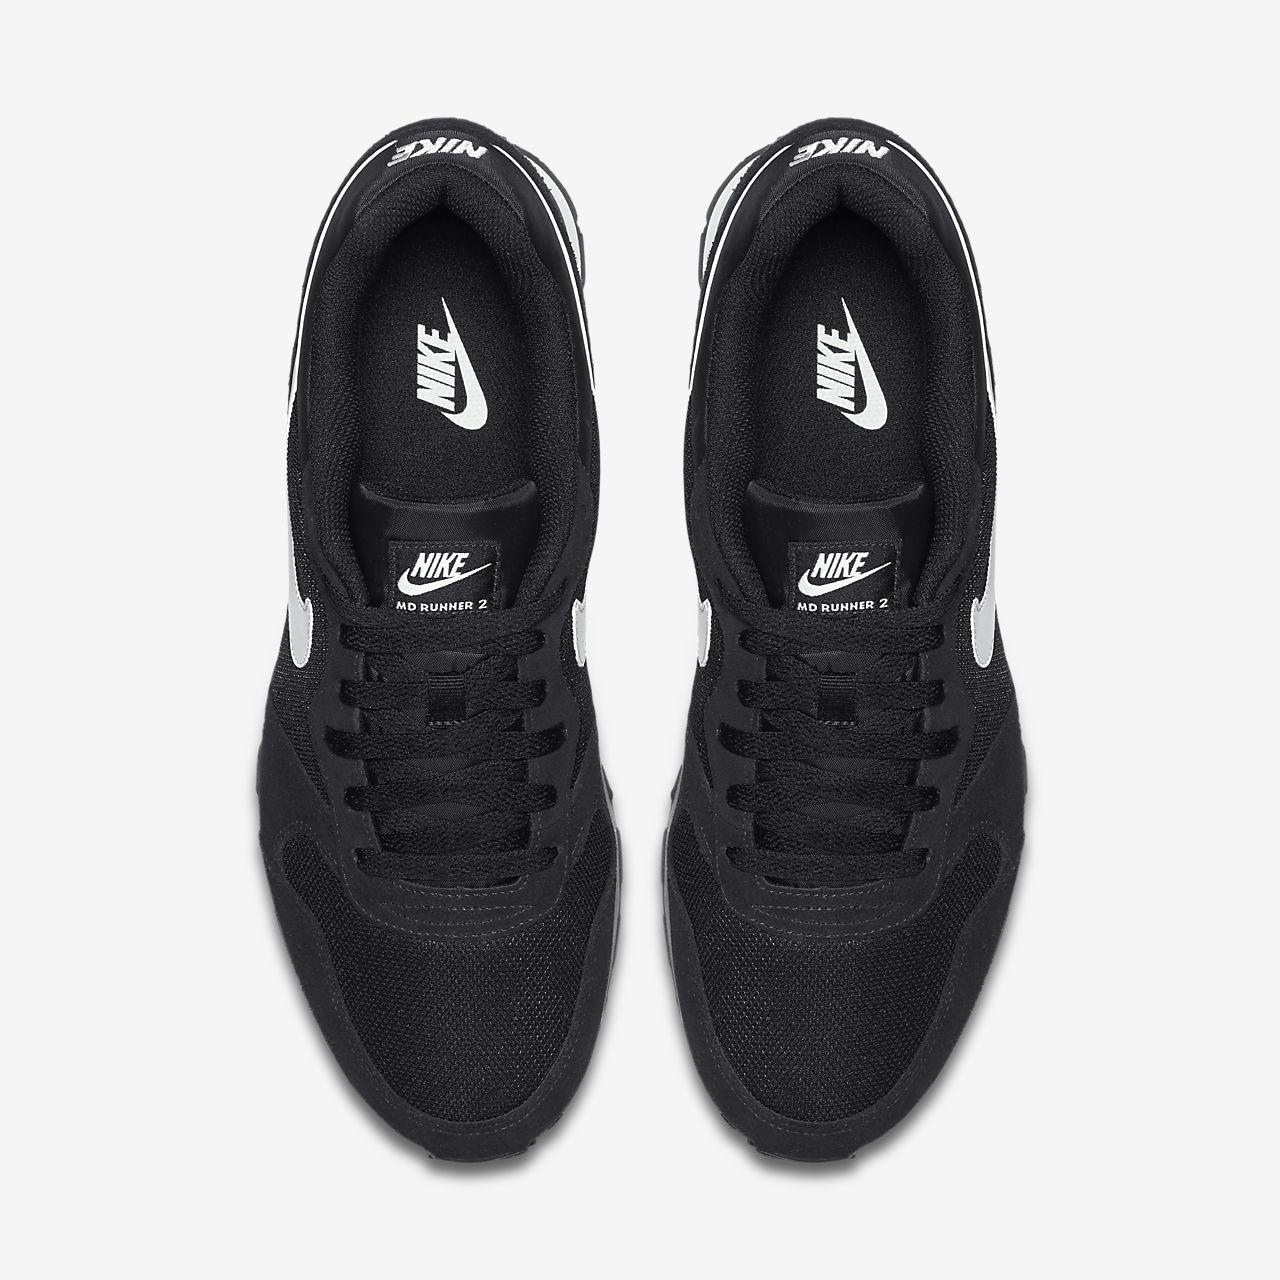 Scarpa Runner Nike Md Runner 2 Uomo